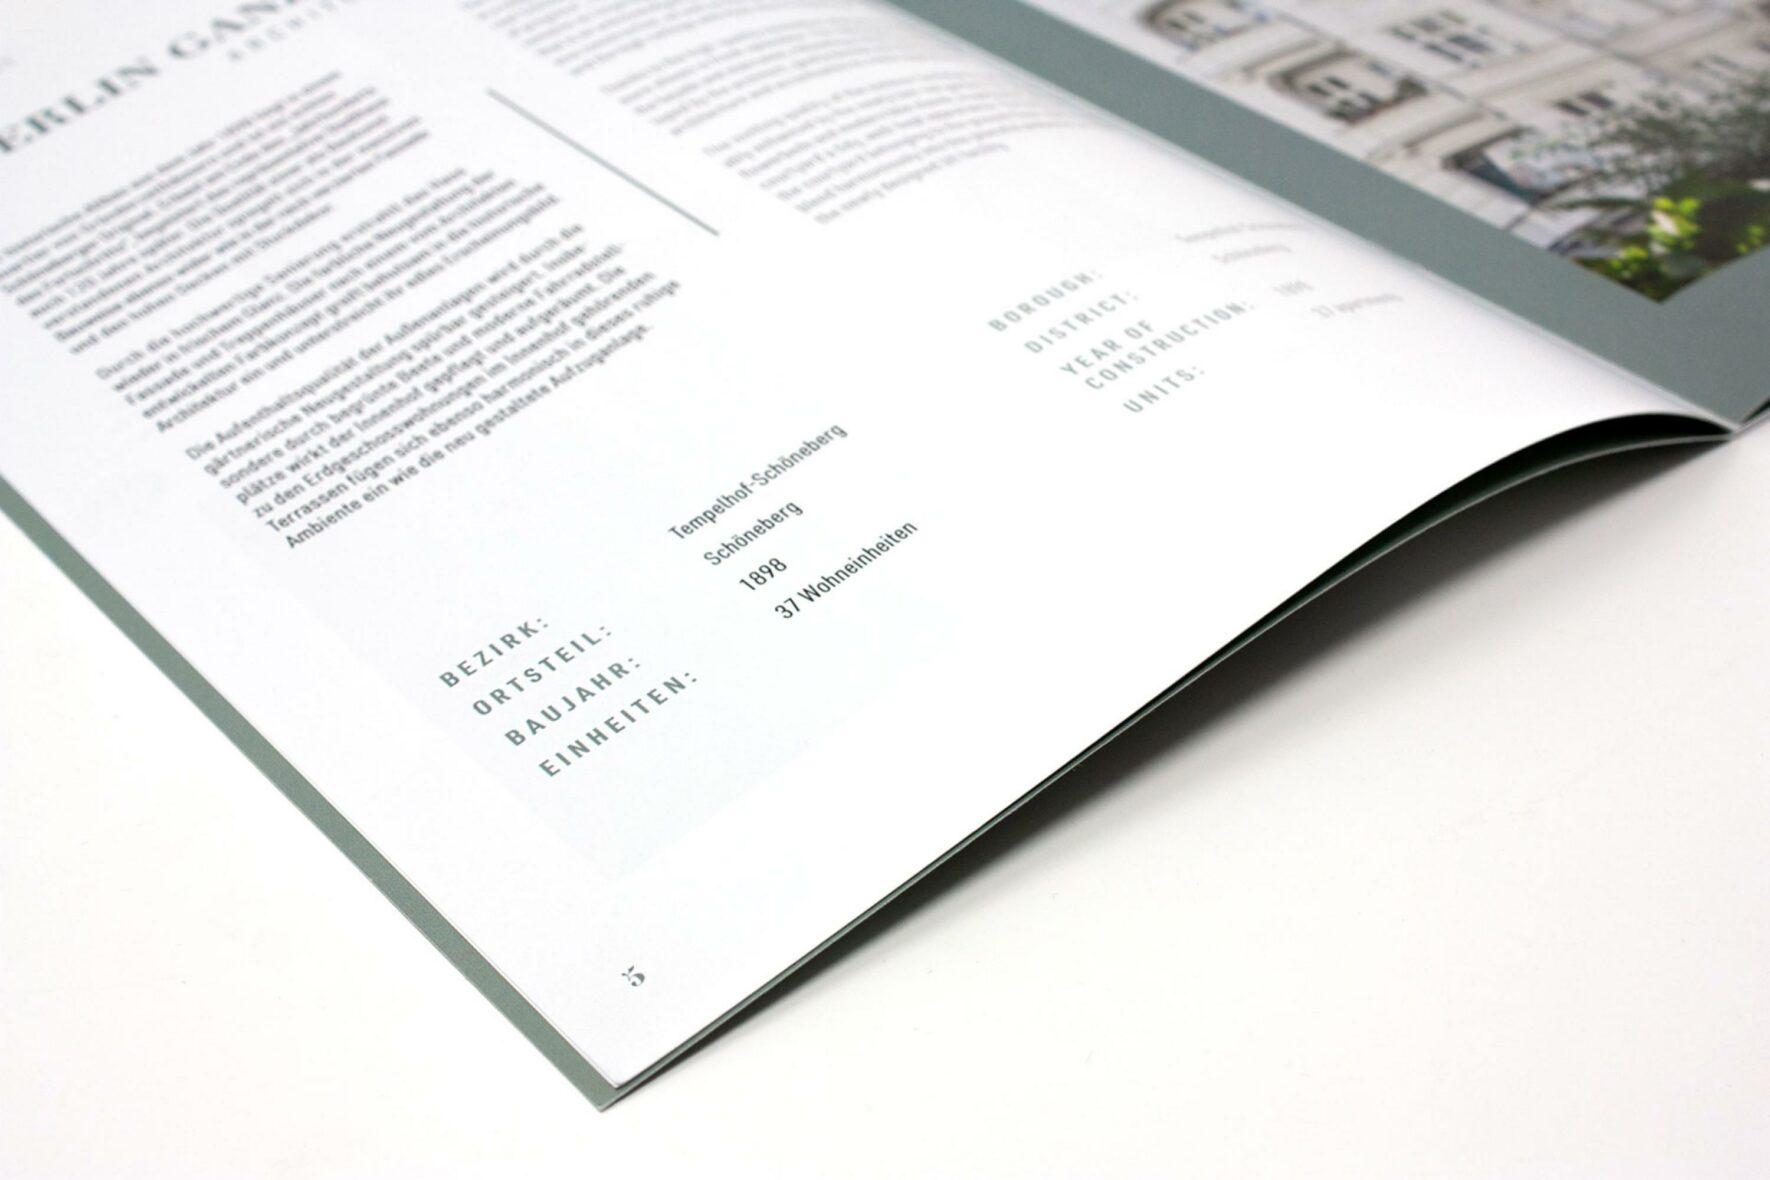 Immobilienbranding-wartburg-Trendcity-Broschüre-FORMLOS-berlin_MG_8286